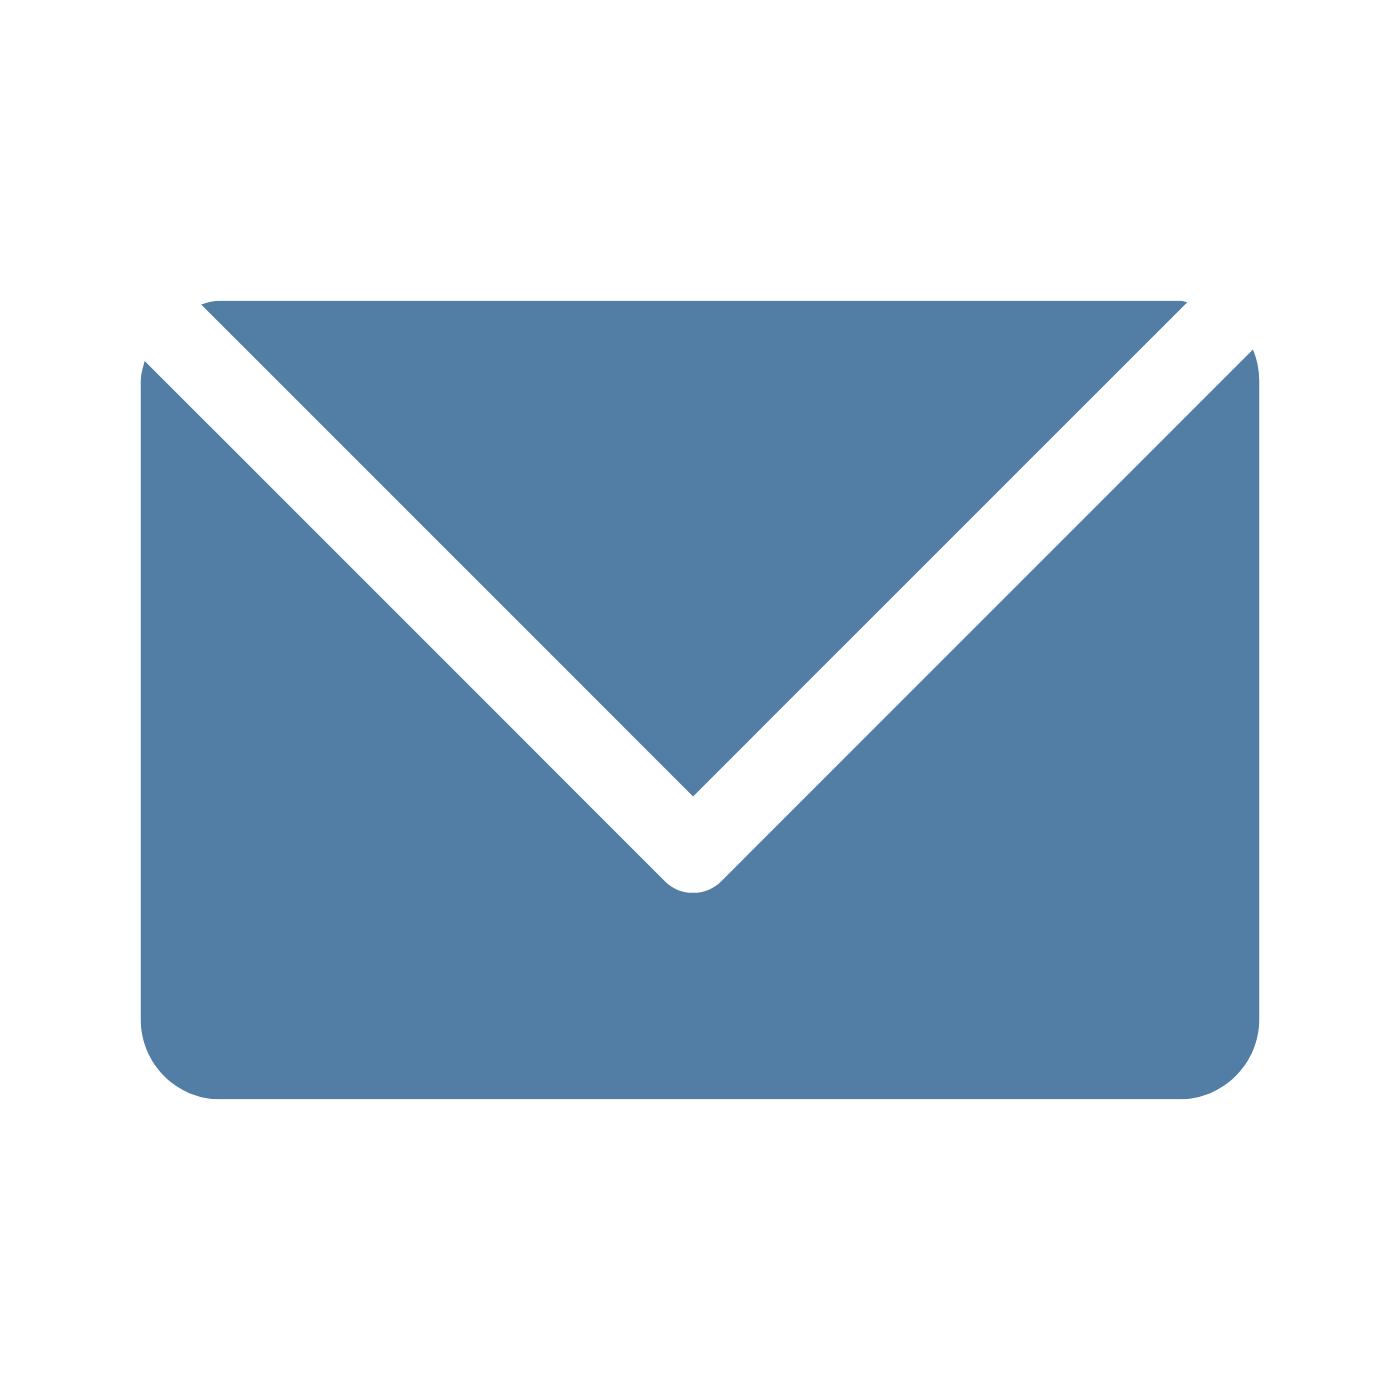 Mail  your check or money order to Crossroads Community Church | 1N100 Gary Avenue | Carol Stream, IL 60188.